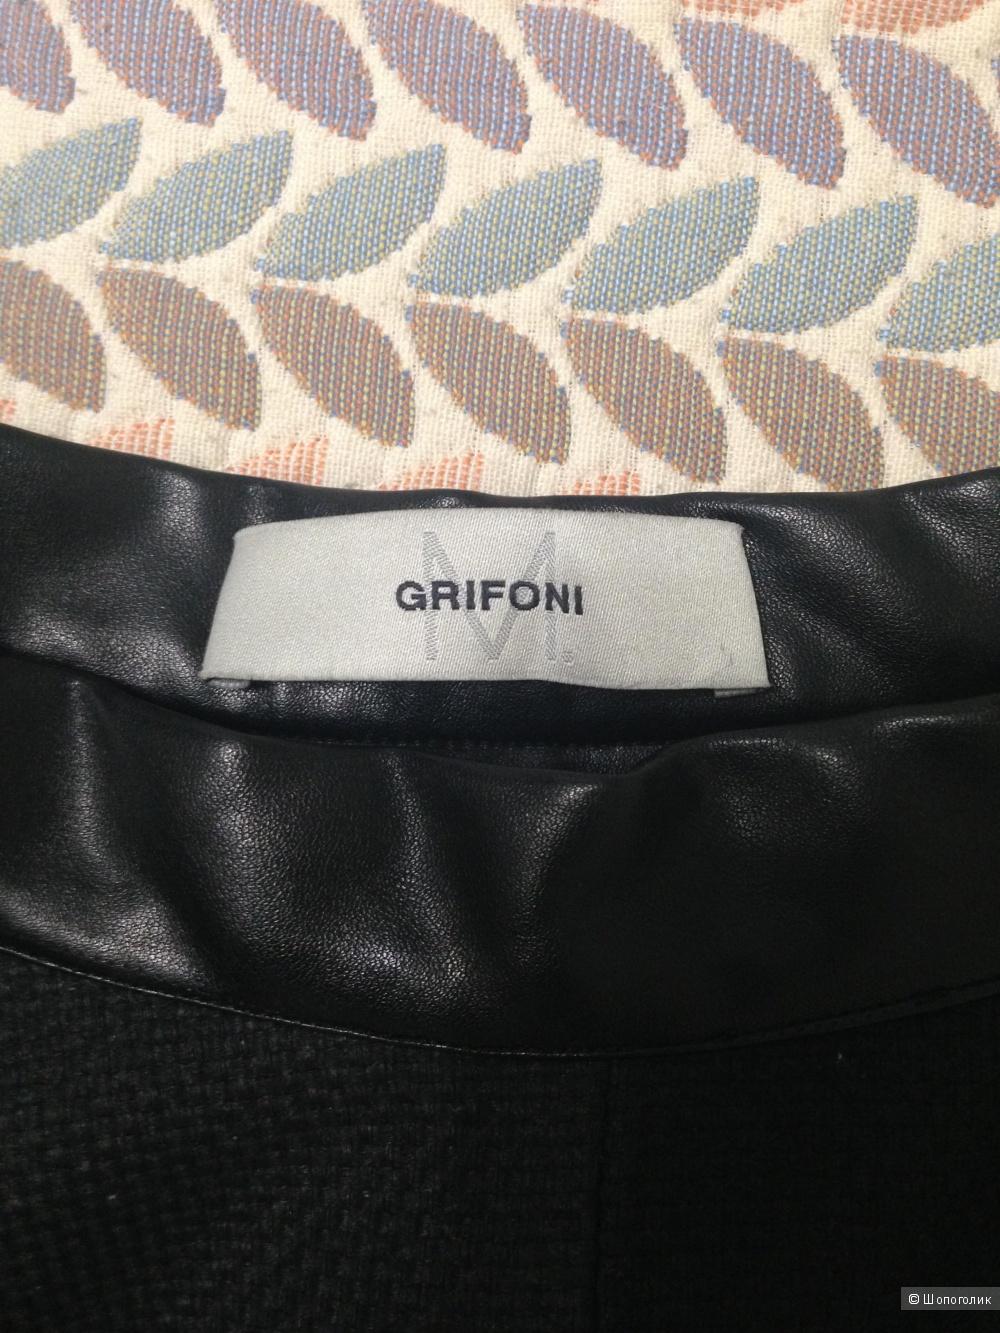 Юбка новая MAURO GRIFONi размер 44 IT